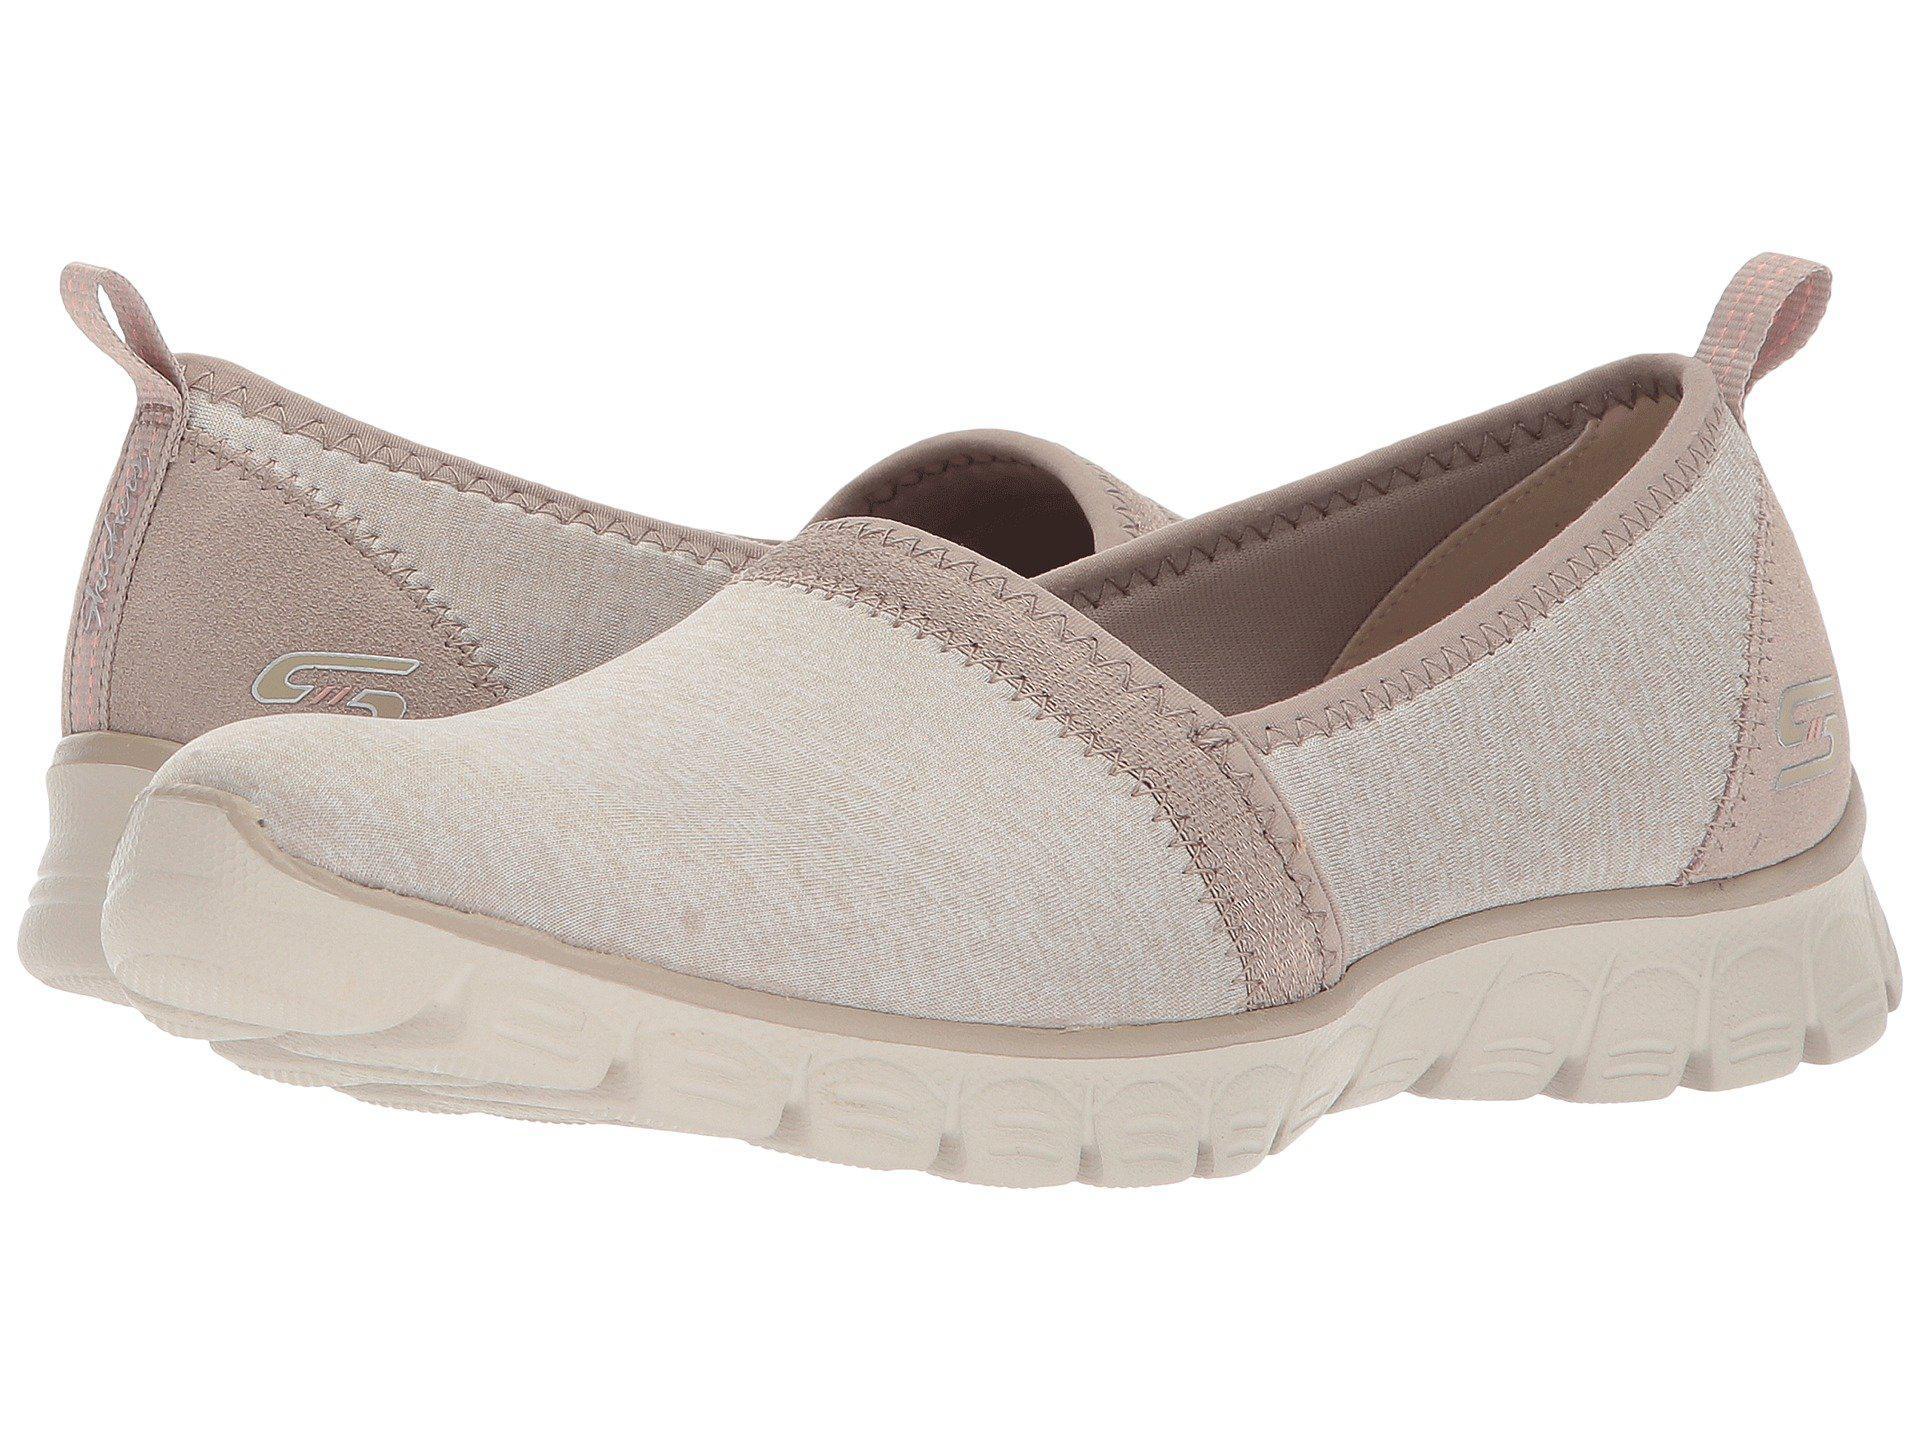 bf9c58a2dfb8 Lyst - Skechers Ez Flex 3.0 Swift Motion (taupe) Women s Slip On Shoes